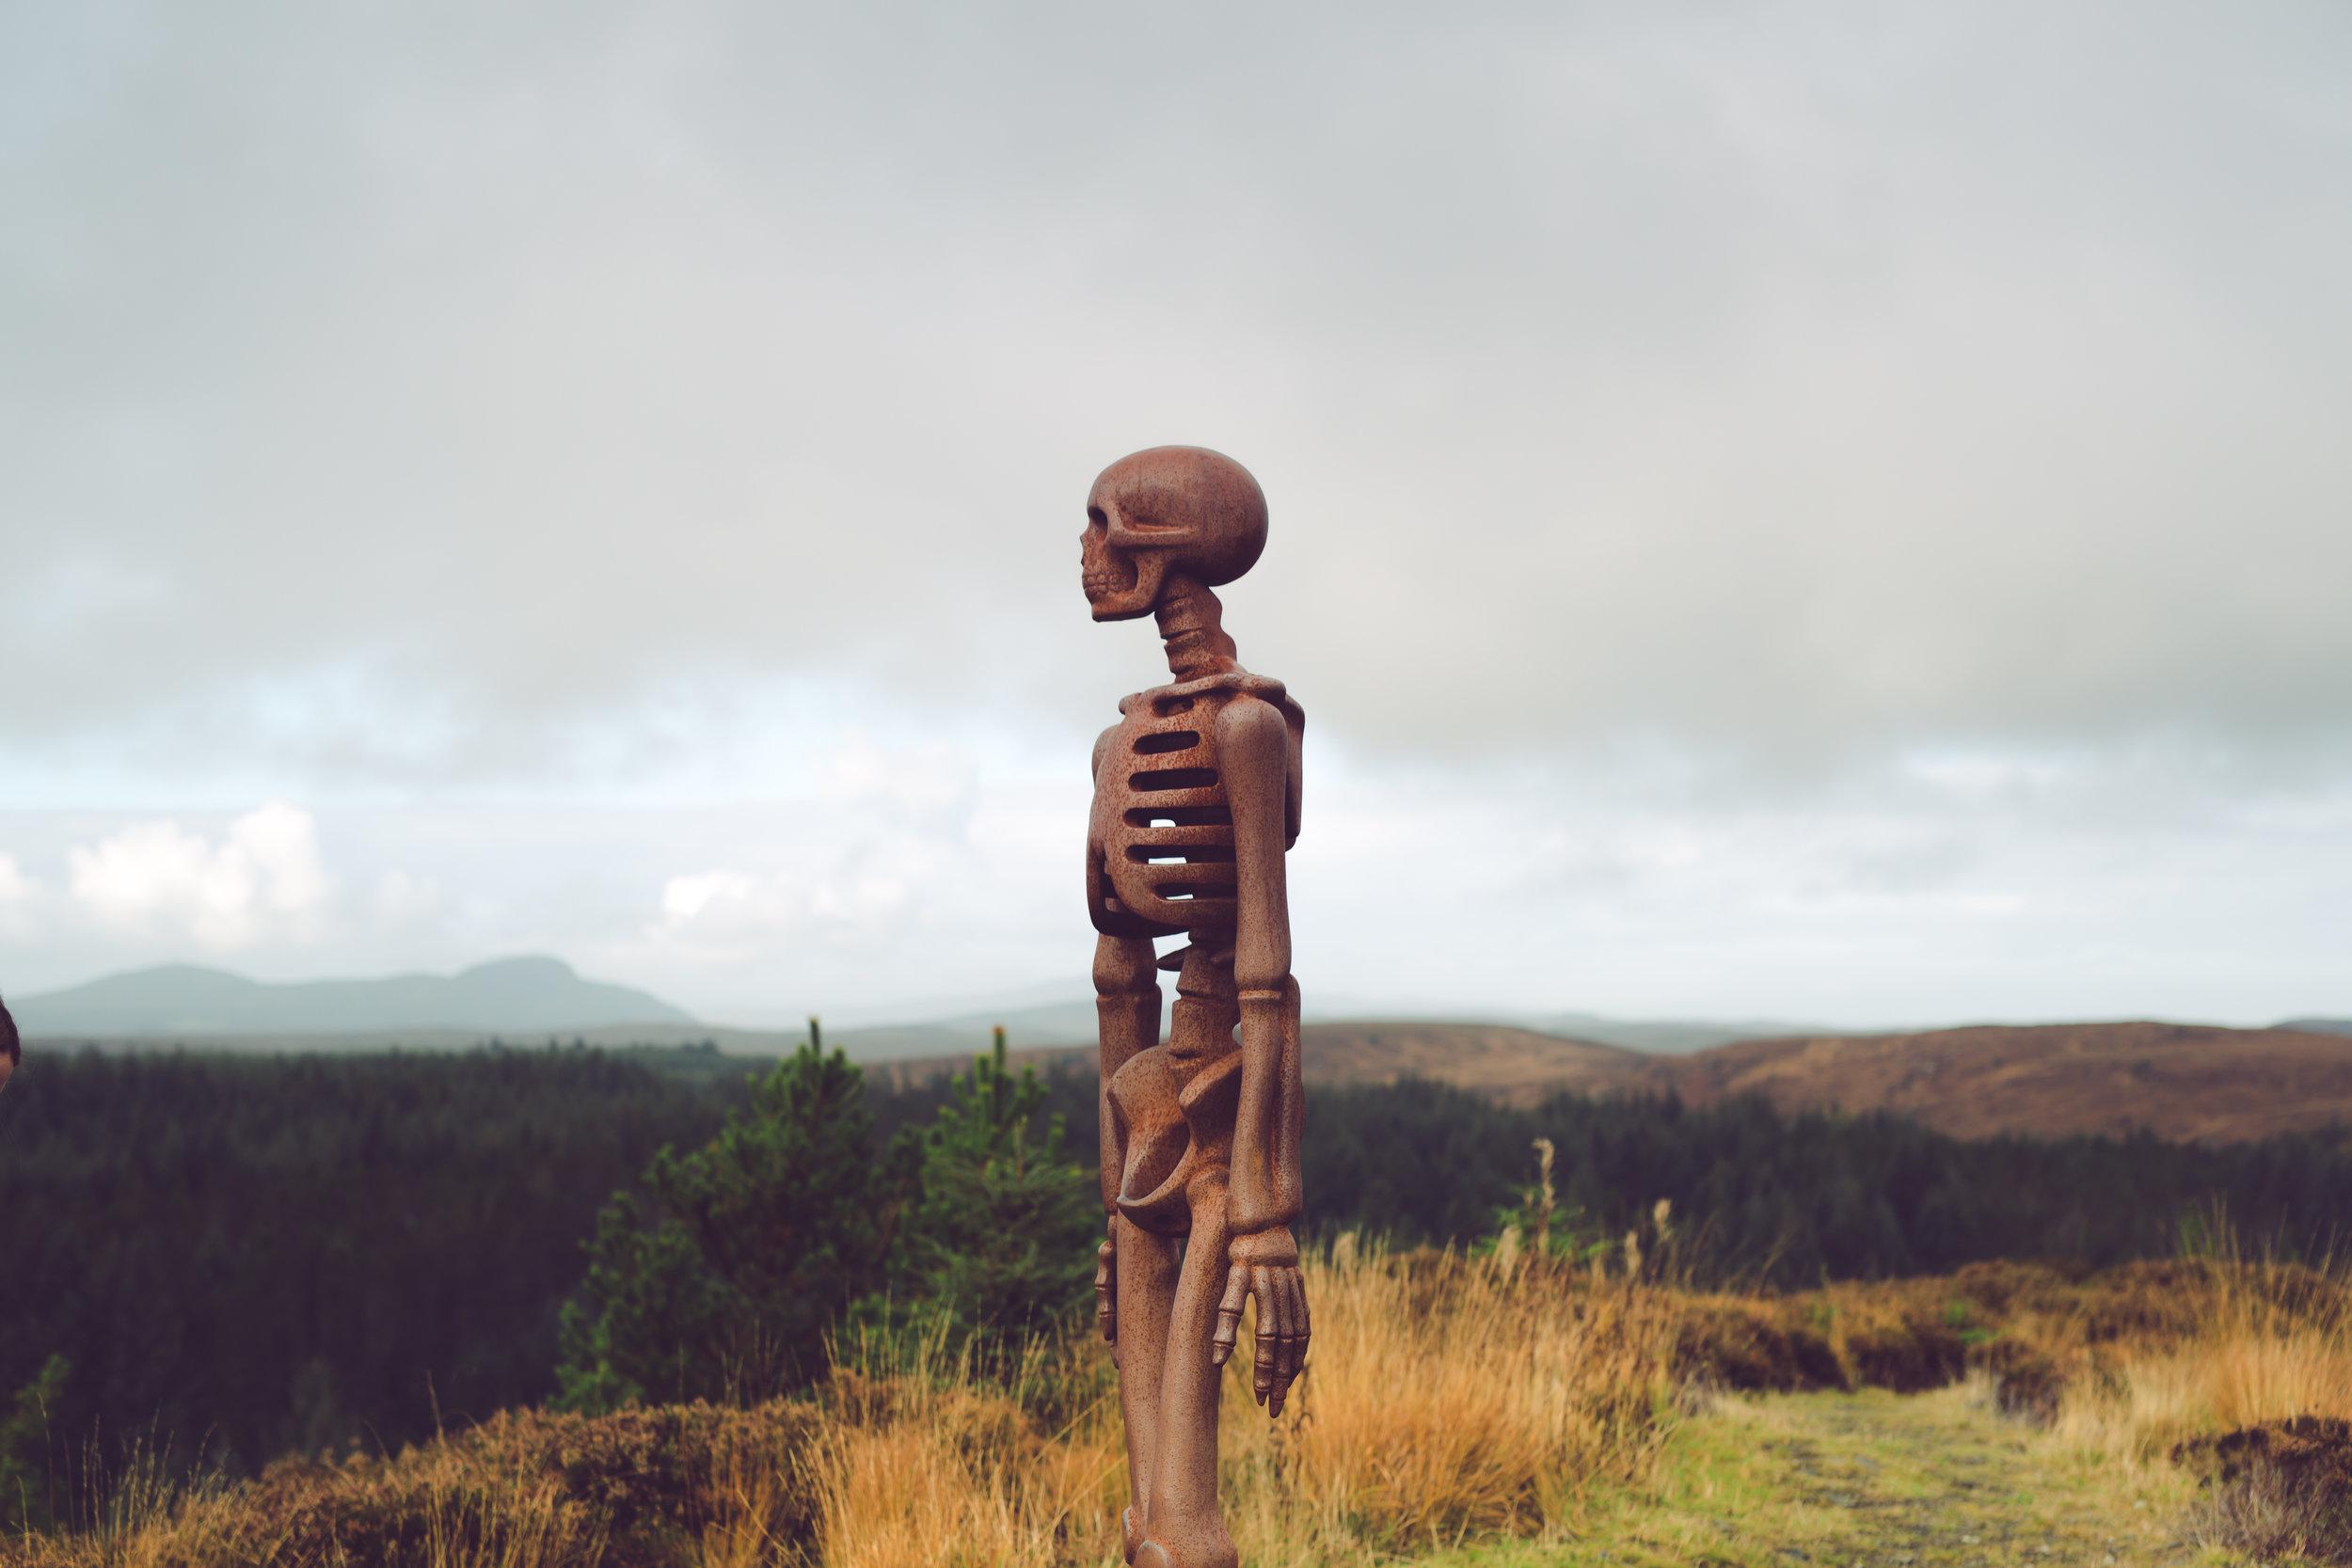 Fraser_Taylor_Scotland-12.jpg